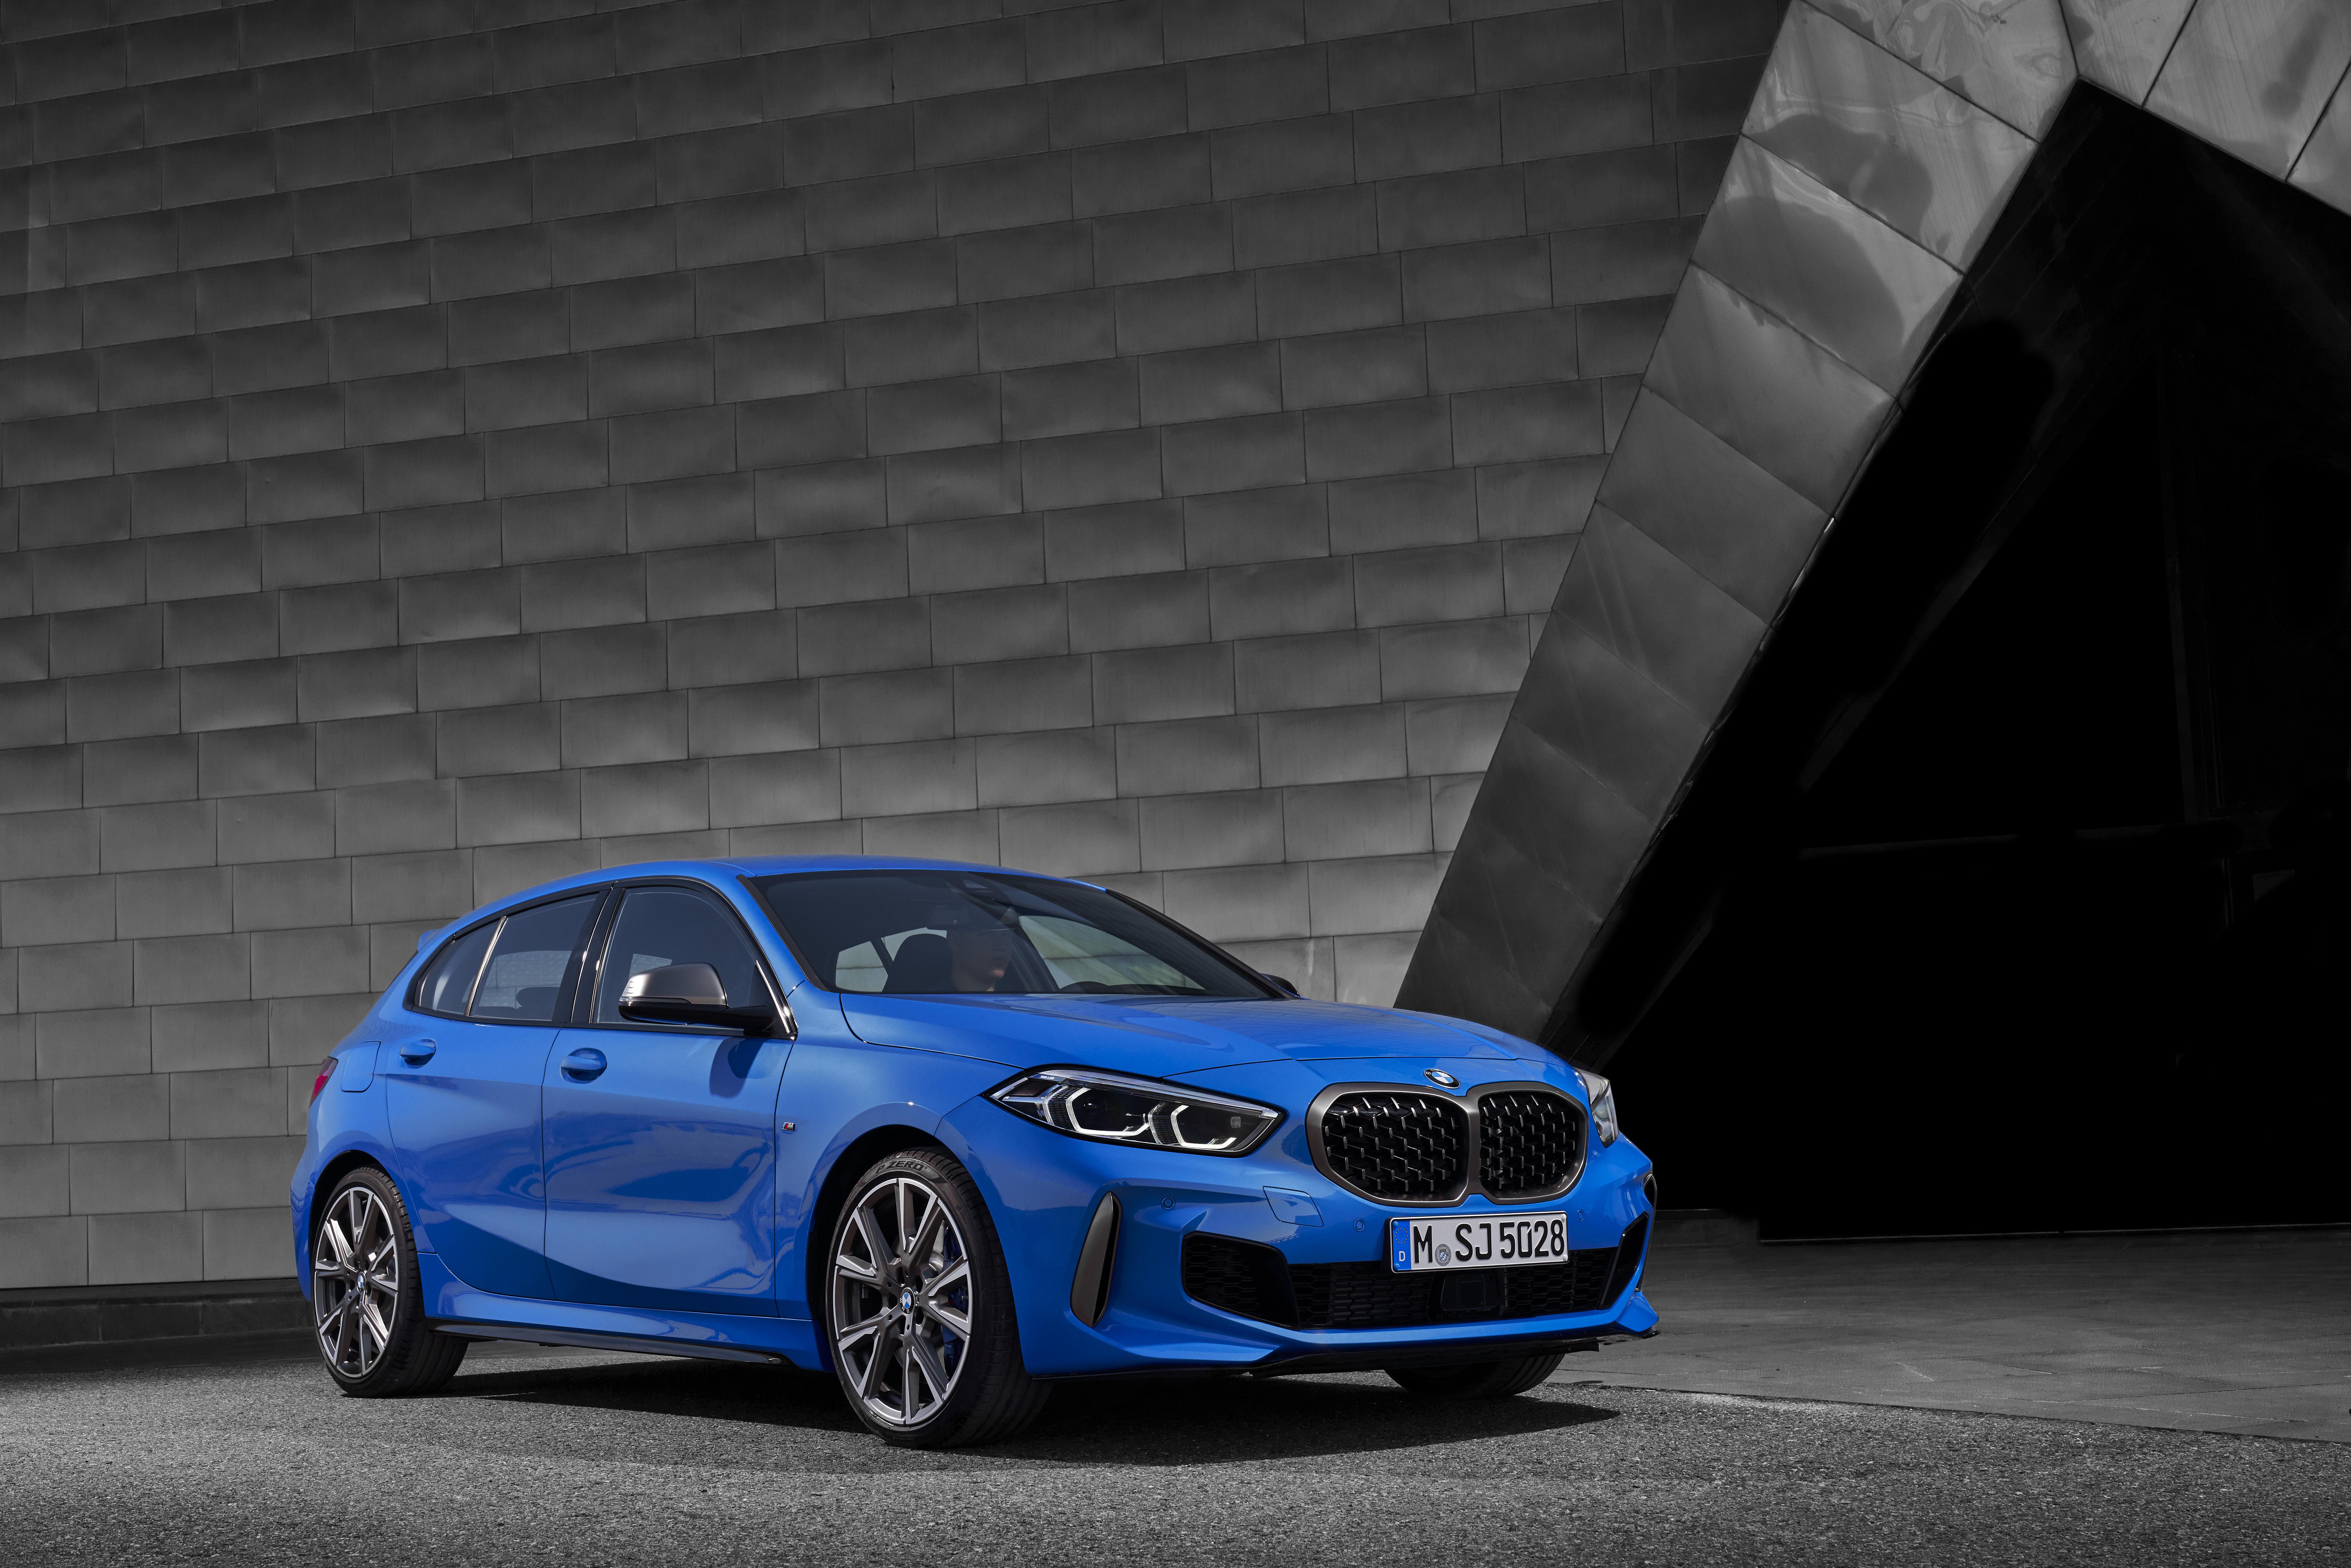 BMW M135i xDrive hot hatch